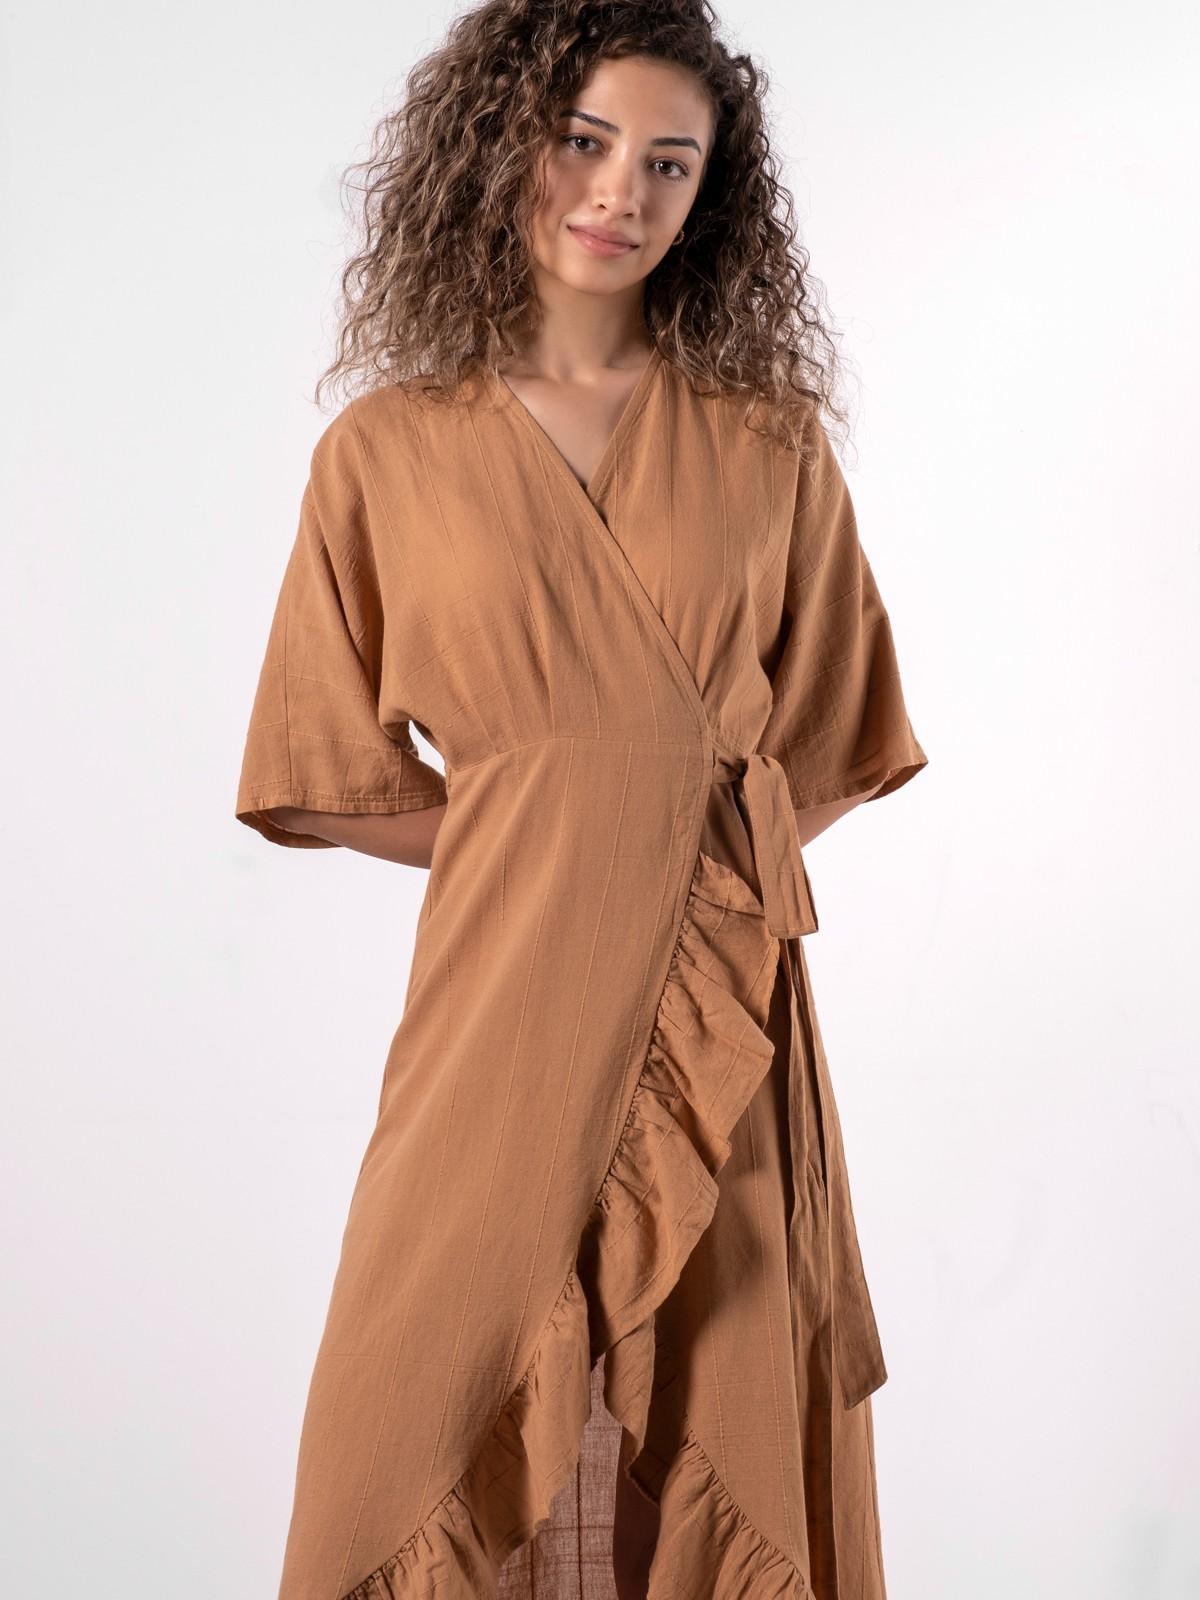 frilled-dress-indiantan4-1200x1600w